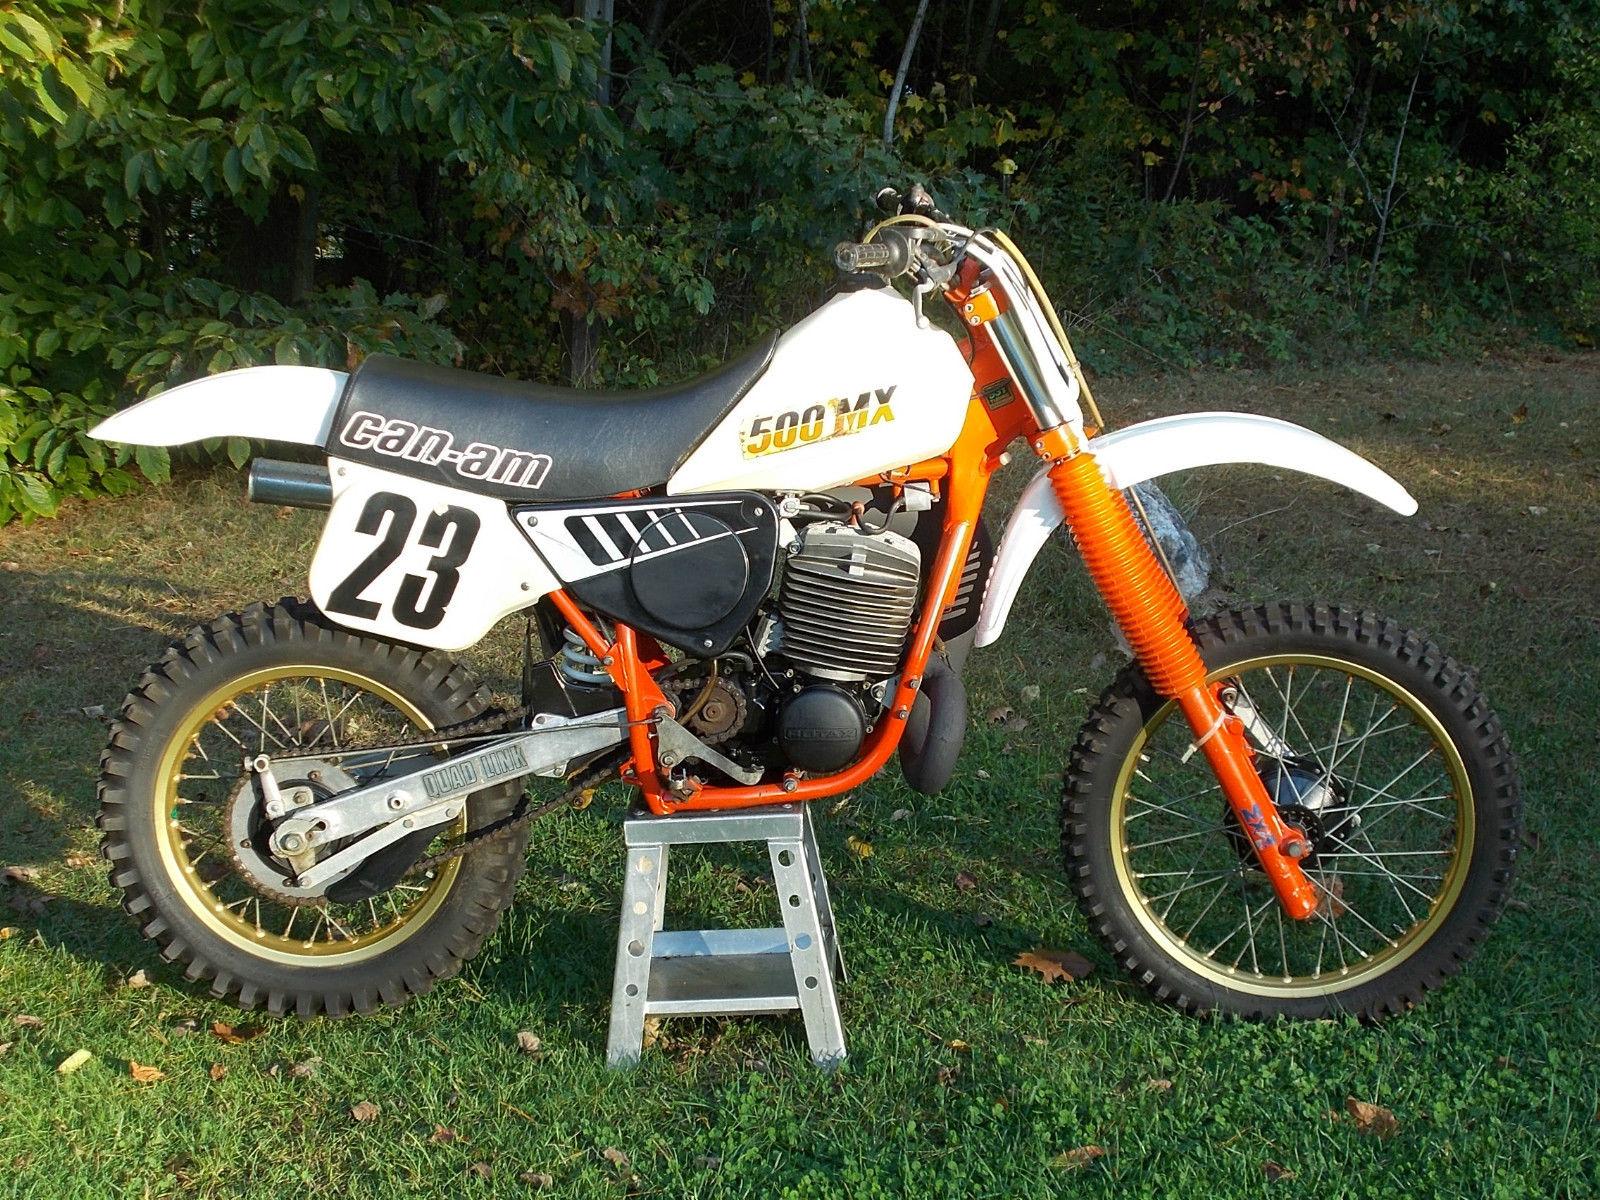 1984 Can Am 500mx Very Nice Low Use Survivor 500cc